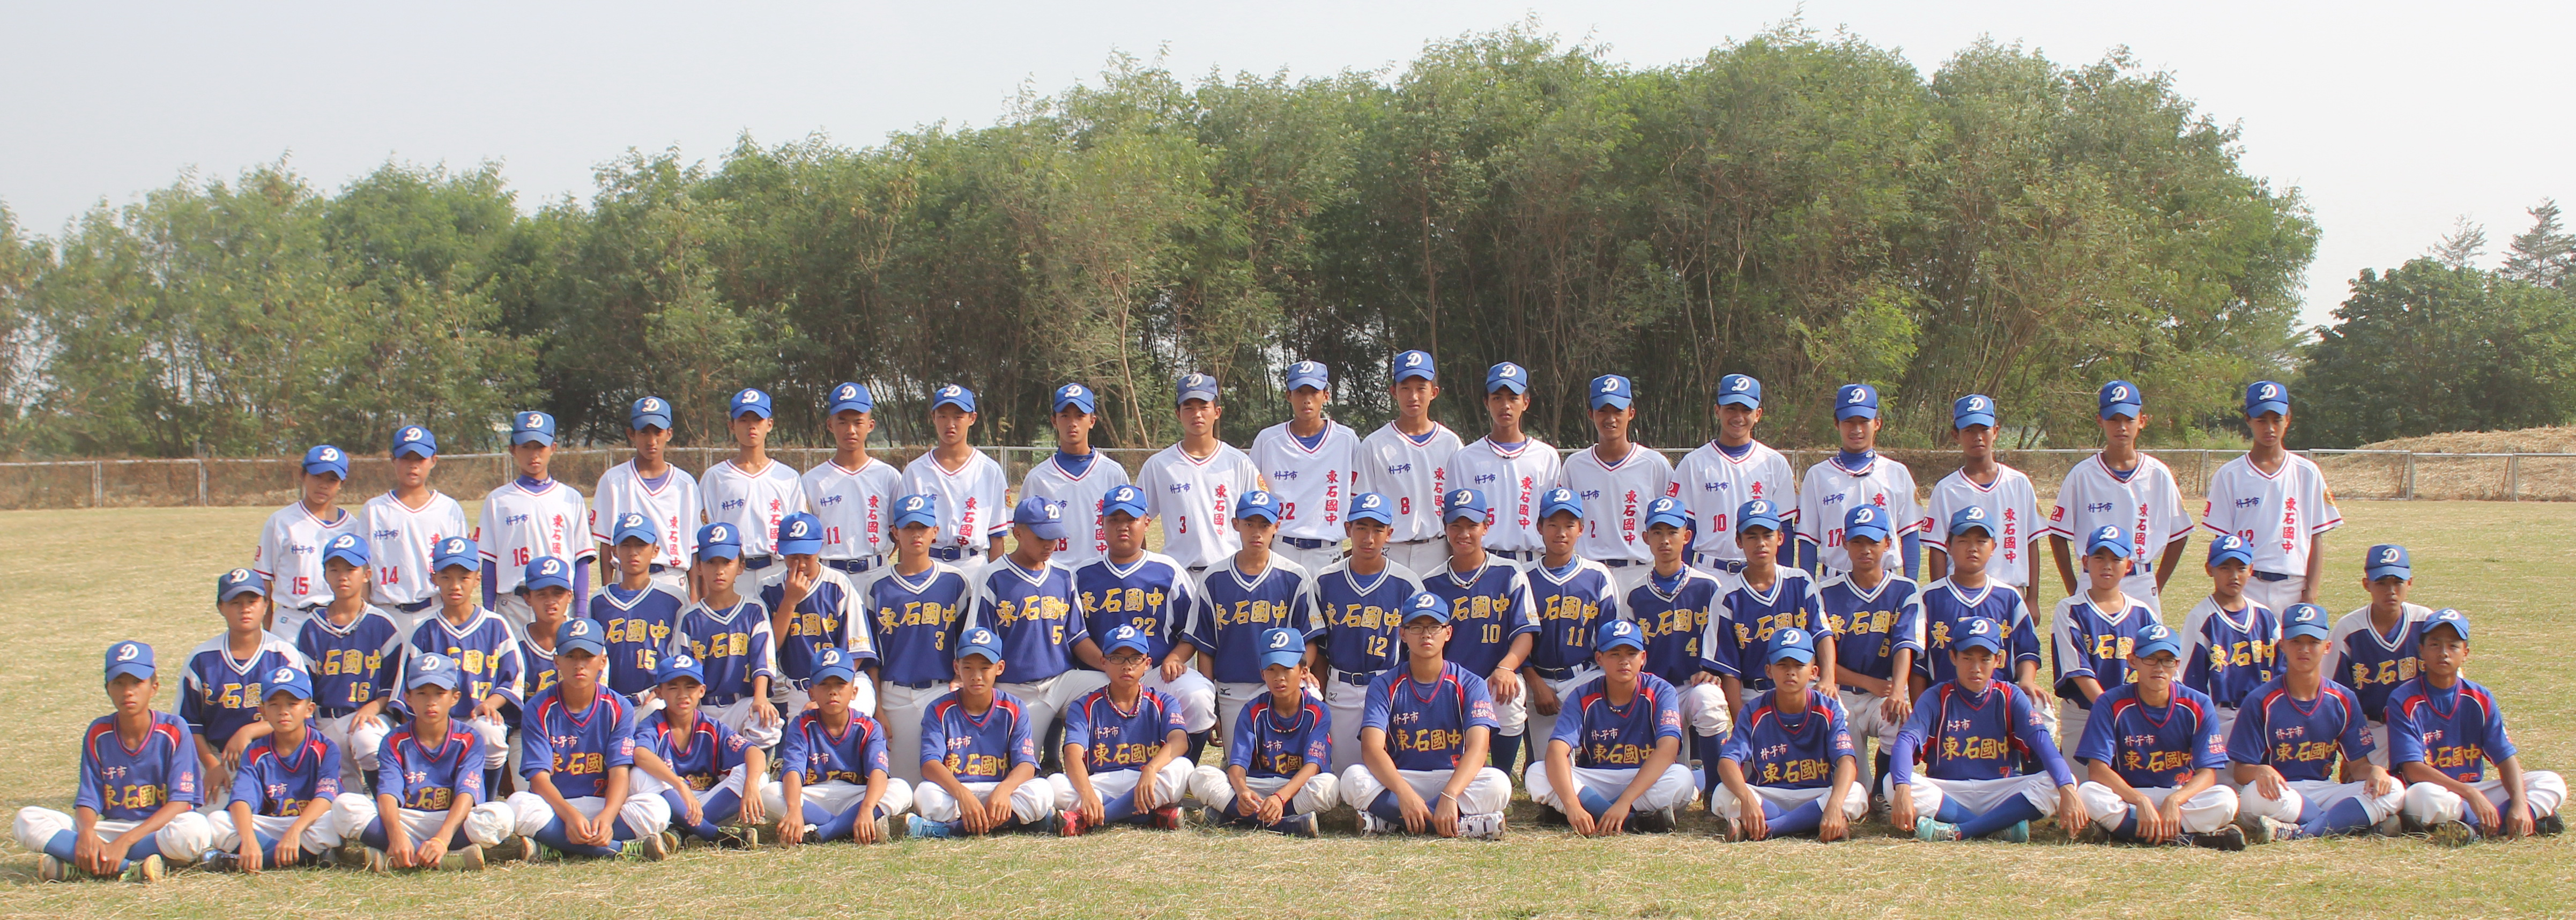 http://www.tsjh.cyc.edu.tw/uploads/tadgallery/2014_03_21/23_棒球.jpg